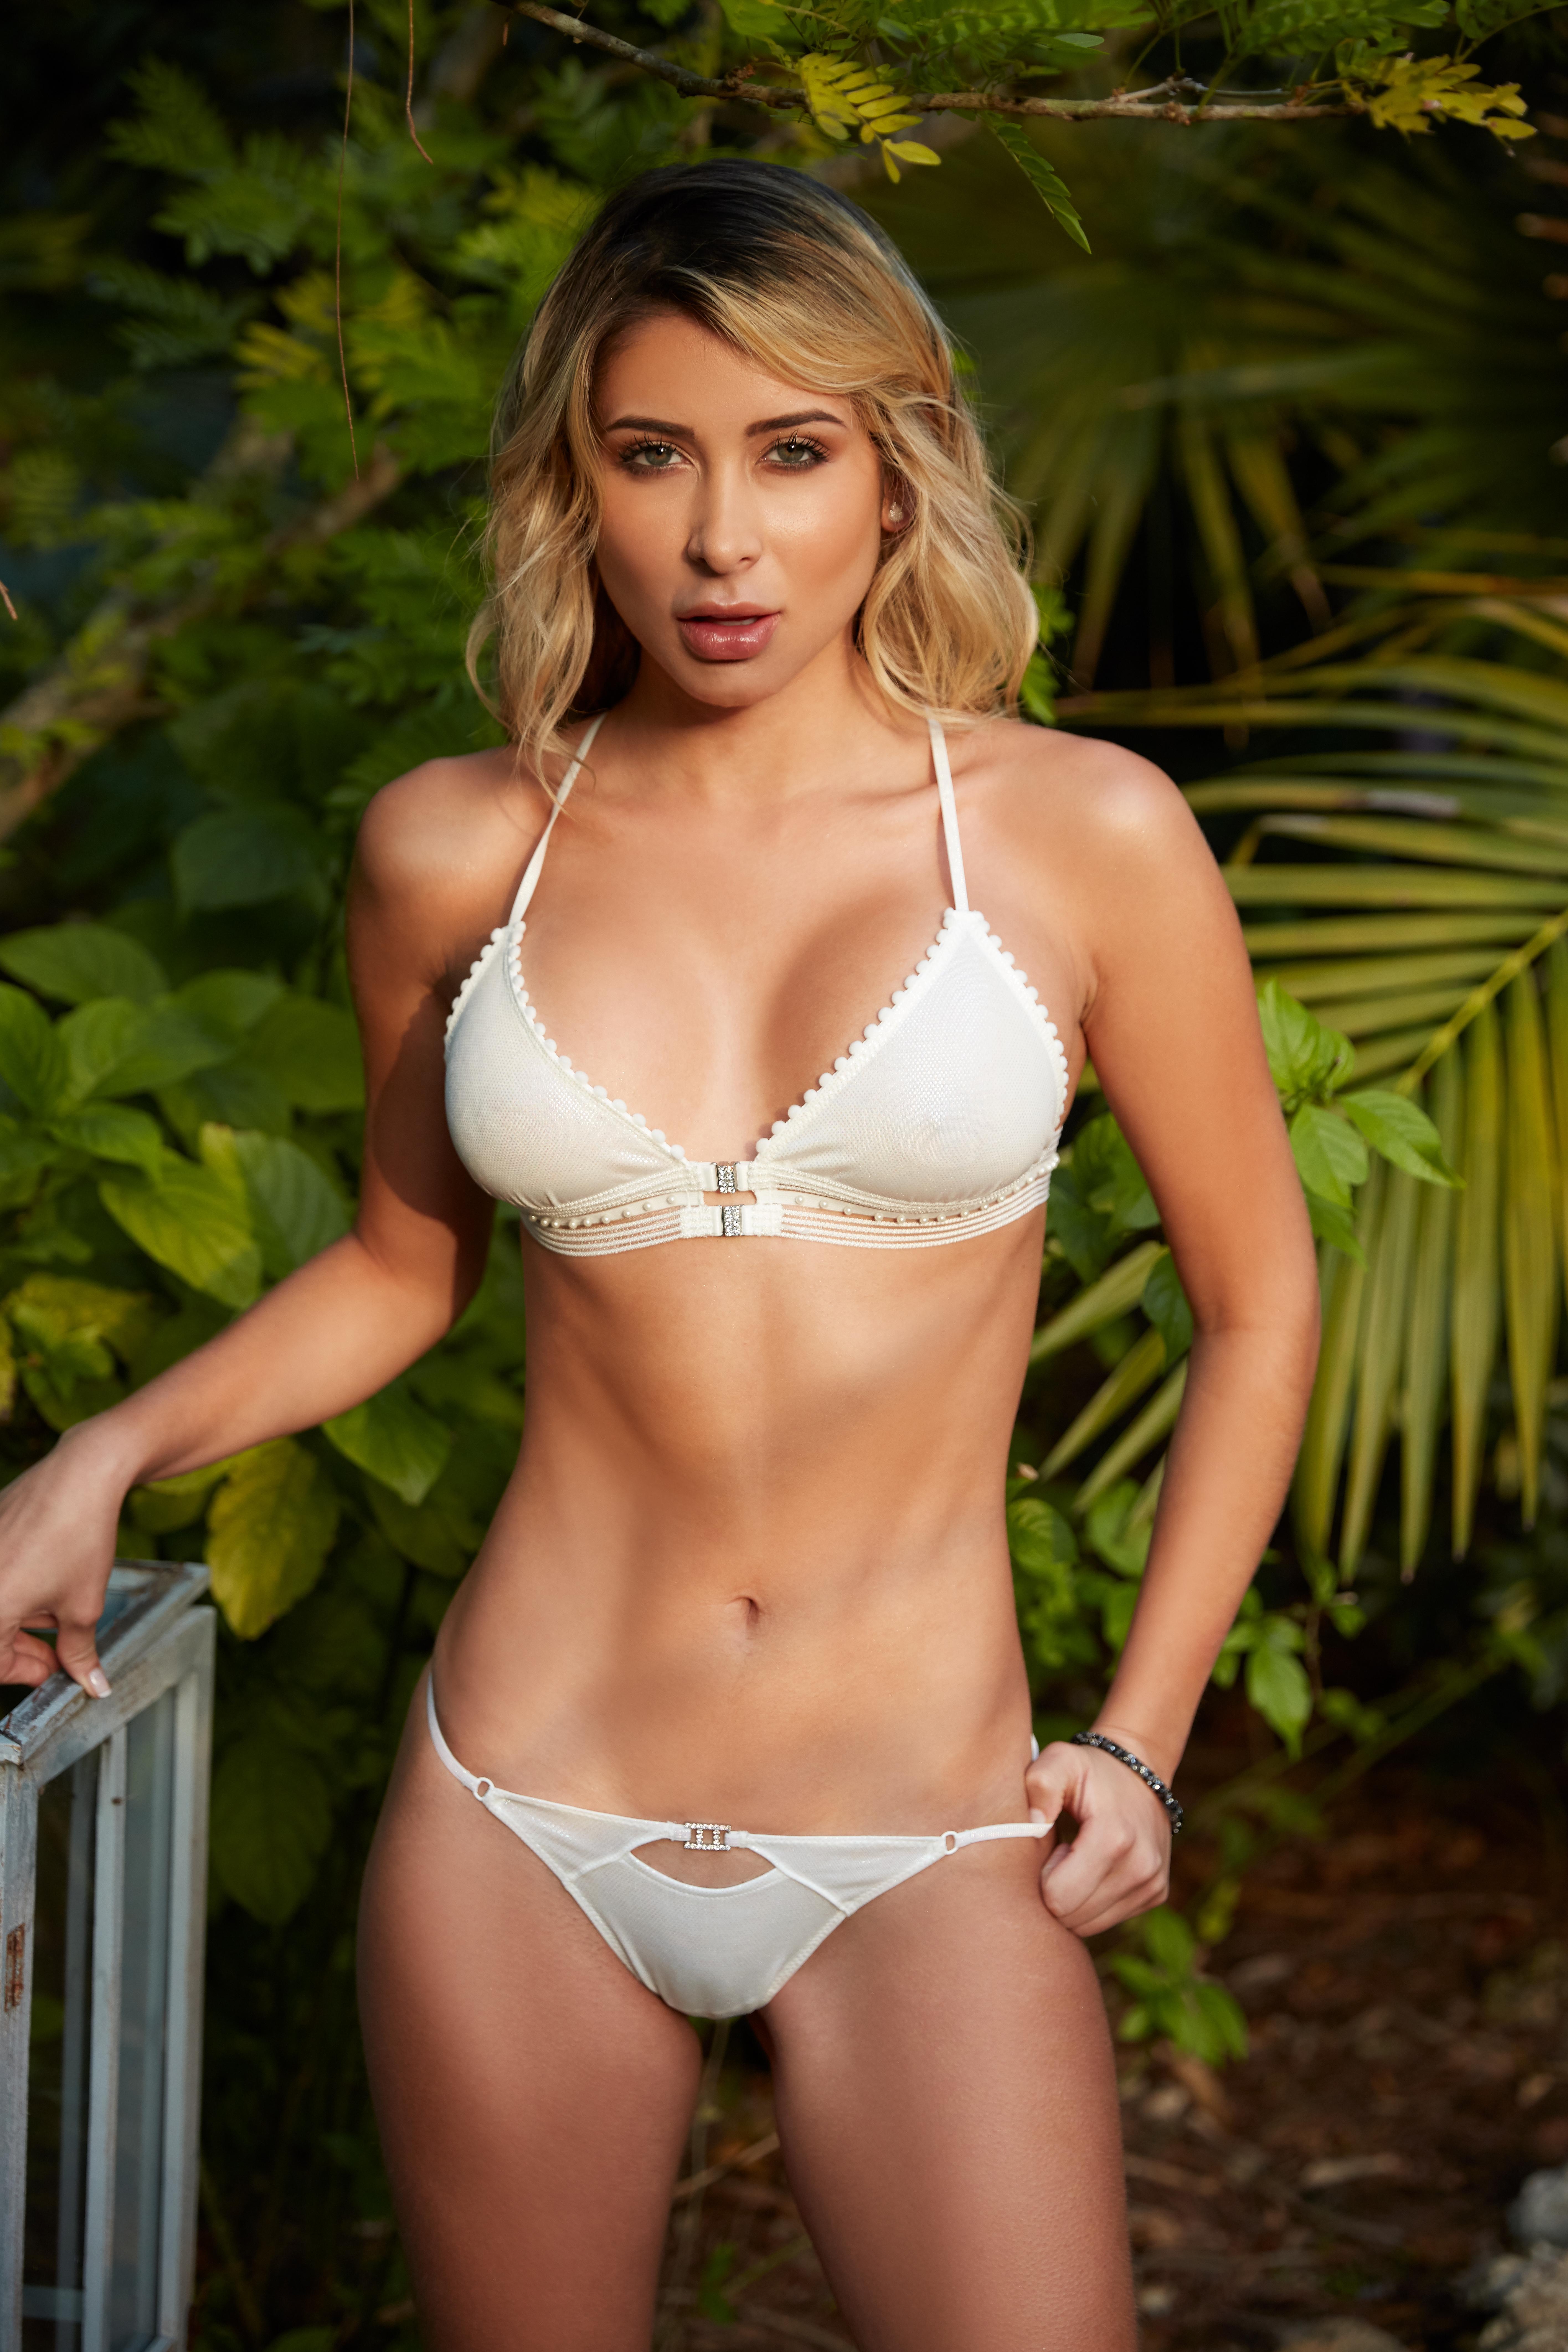 Pics Laura Monroy nude (68 photo), Sexy, Leaked, Selfie, lingerie 2020